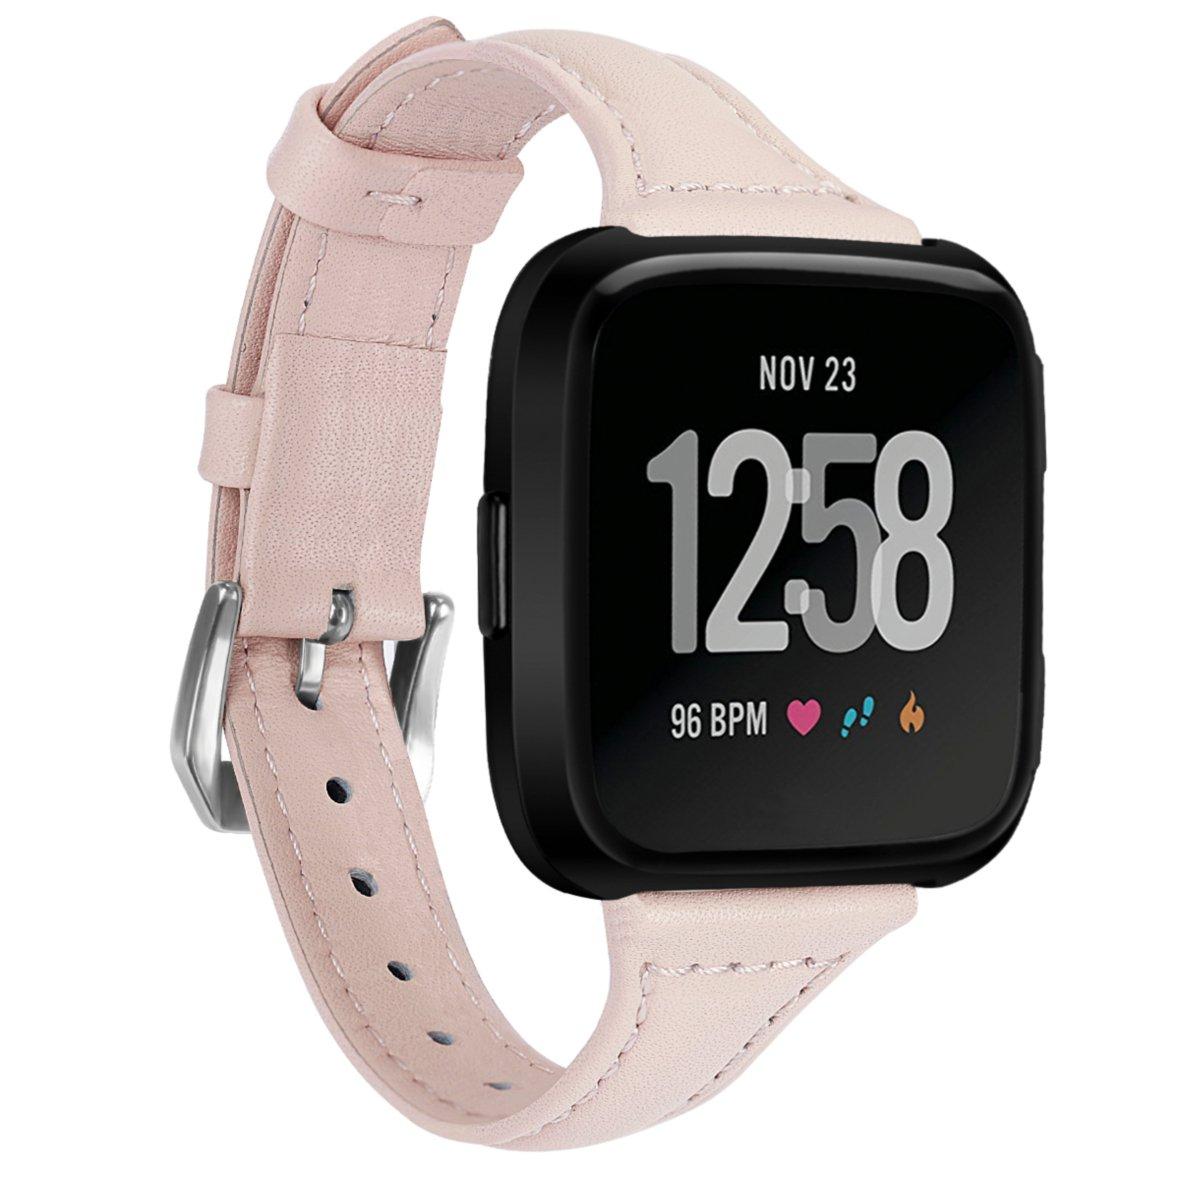 btchoice for Fitbit Versaストラップ、本革バンド交換リストバンドfor Fitbit Versaブレスレットスマート腕時計 ピンク ピンク B07C4HJPSZ